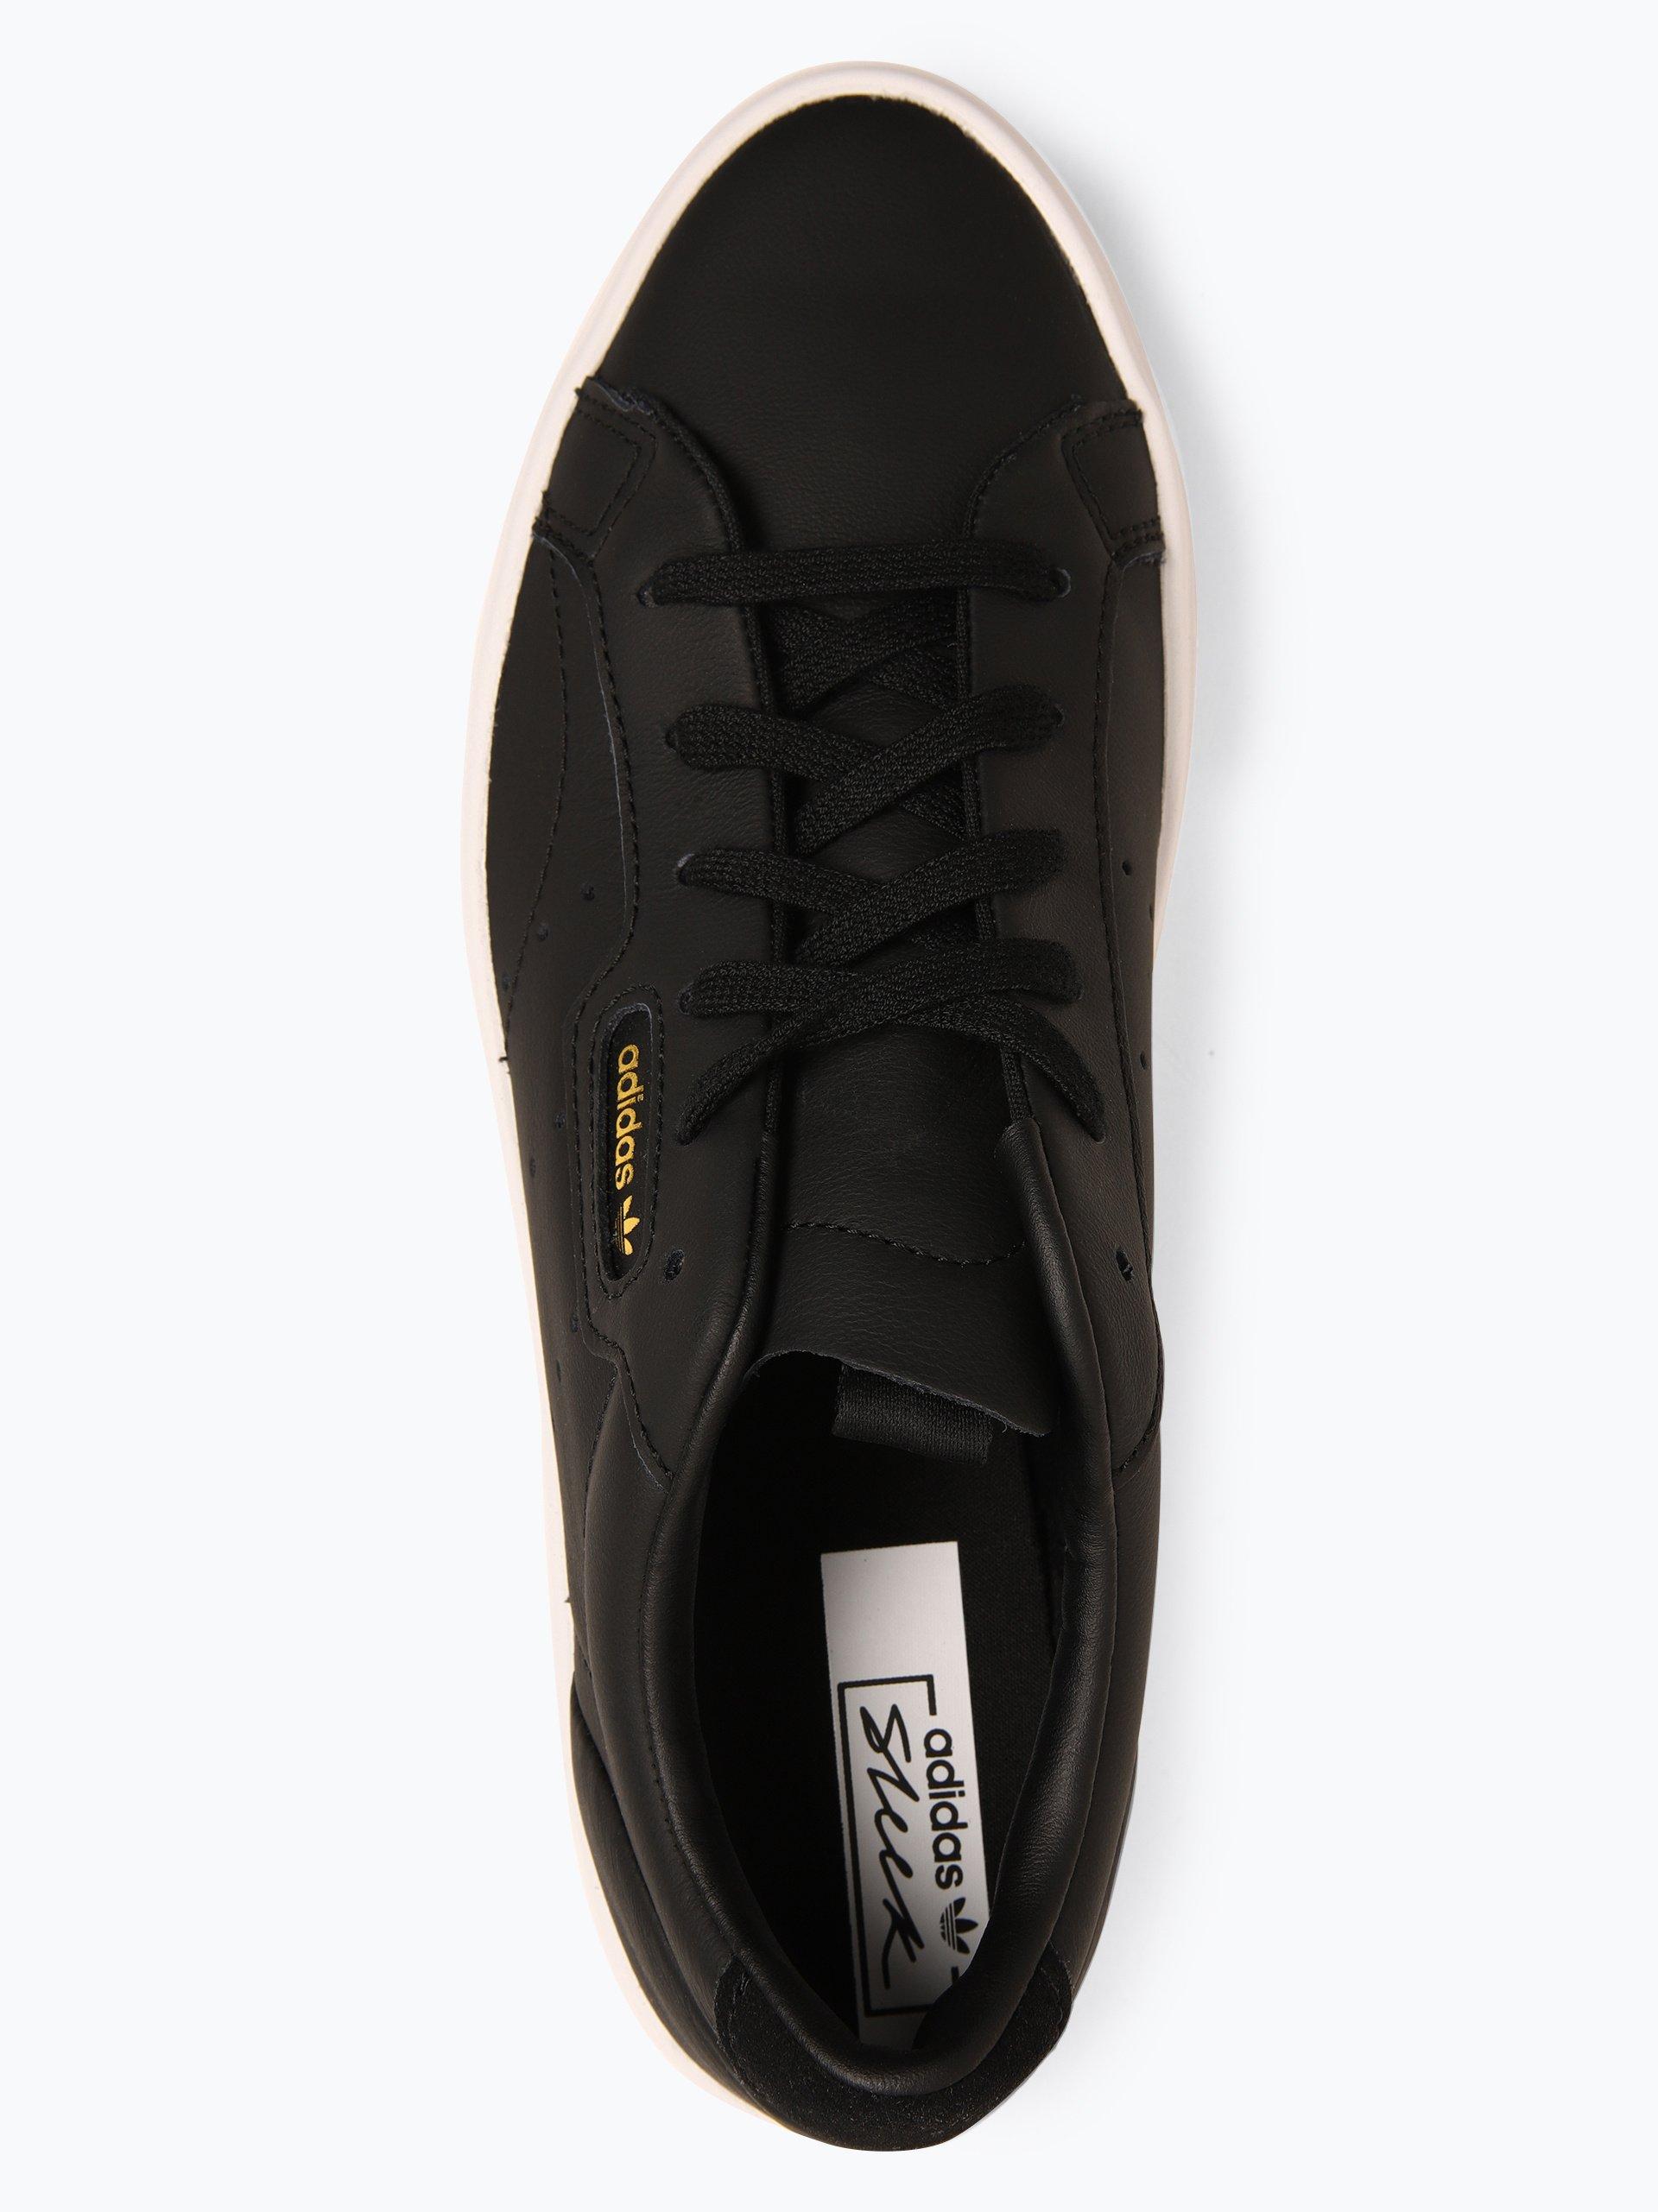 adidas Originals Damen Sneaker aus Leder - Sleek W